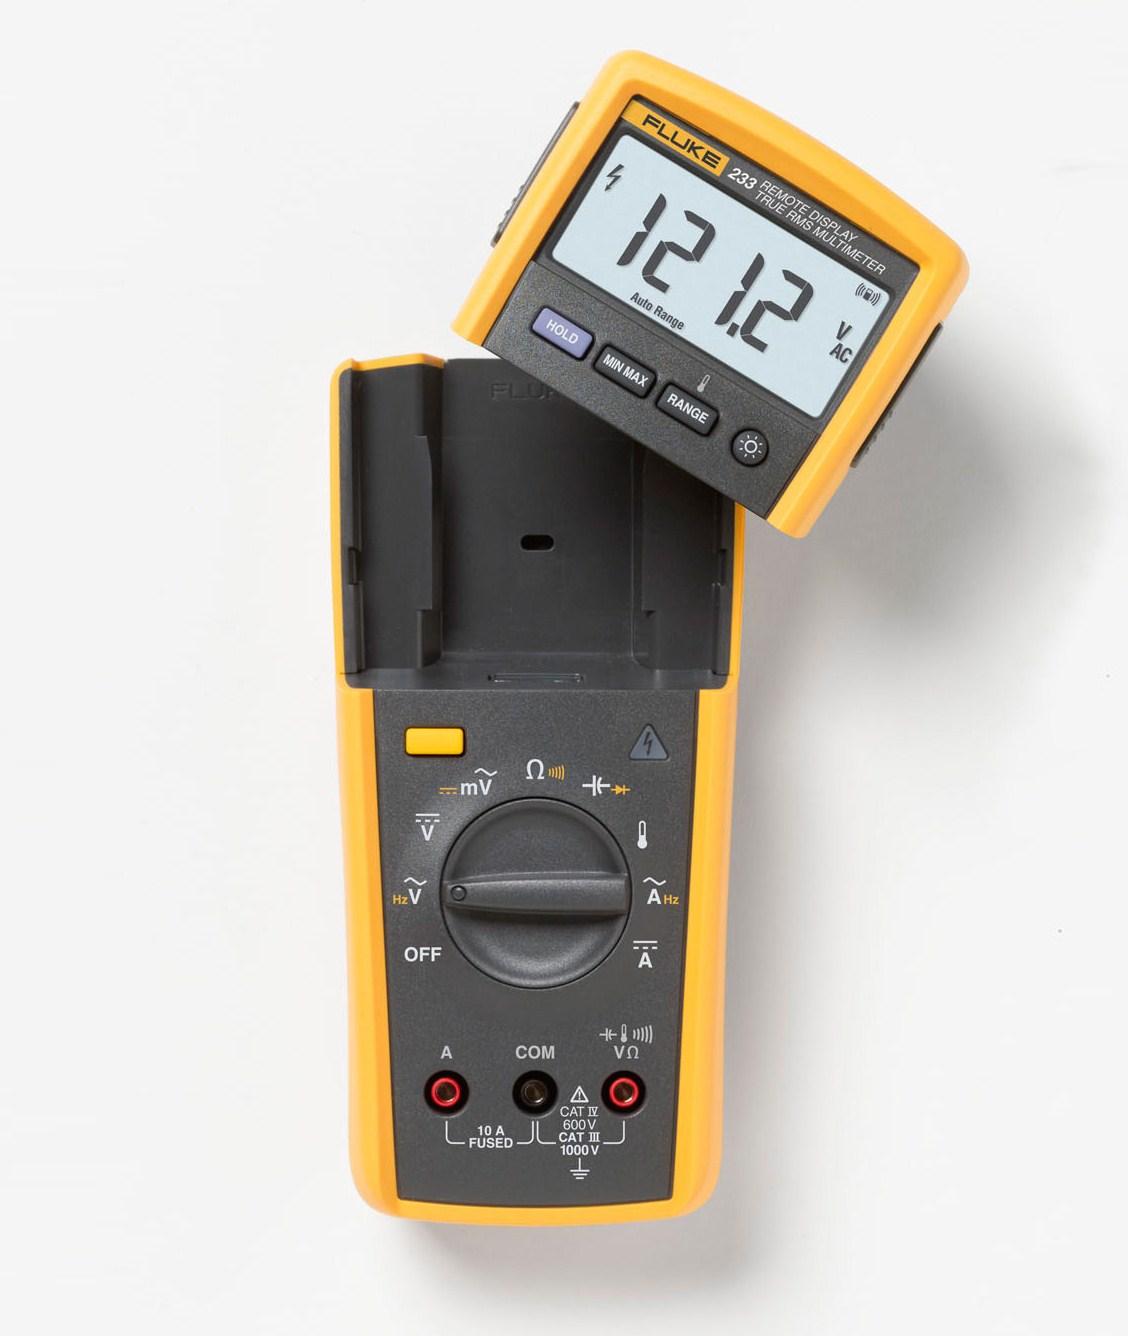 Automotive Digital Multimeter : Fluke a remote display automotive digital